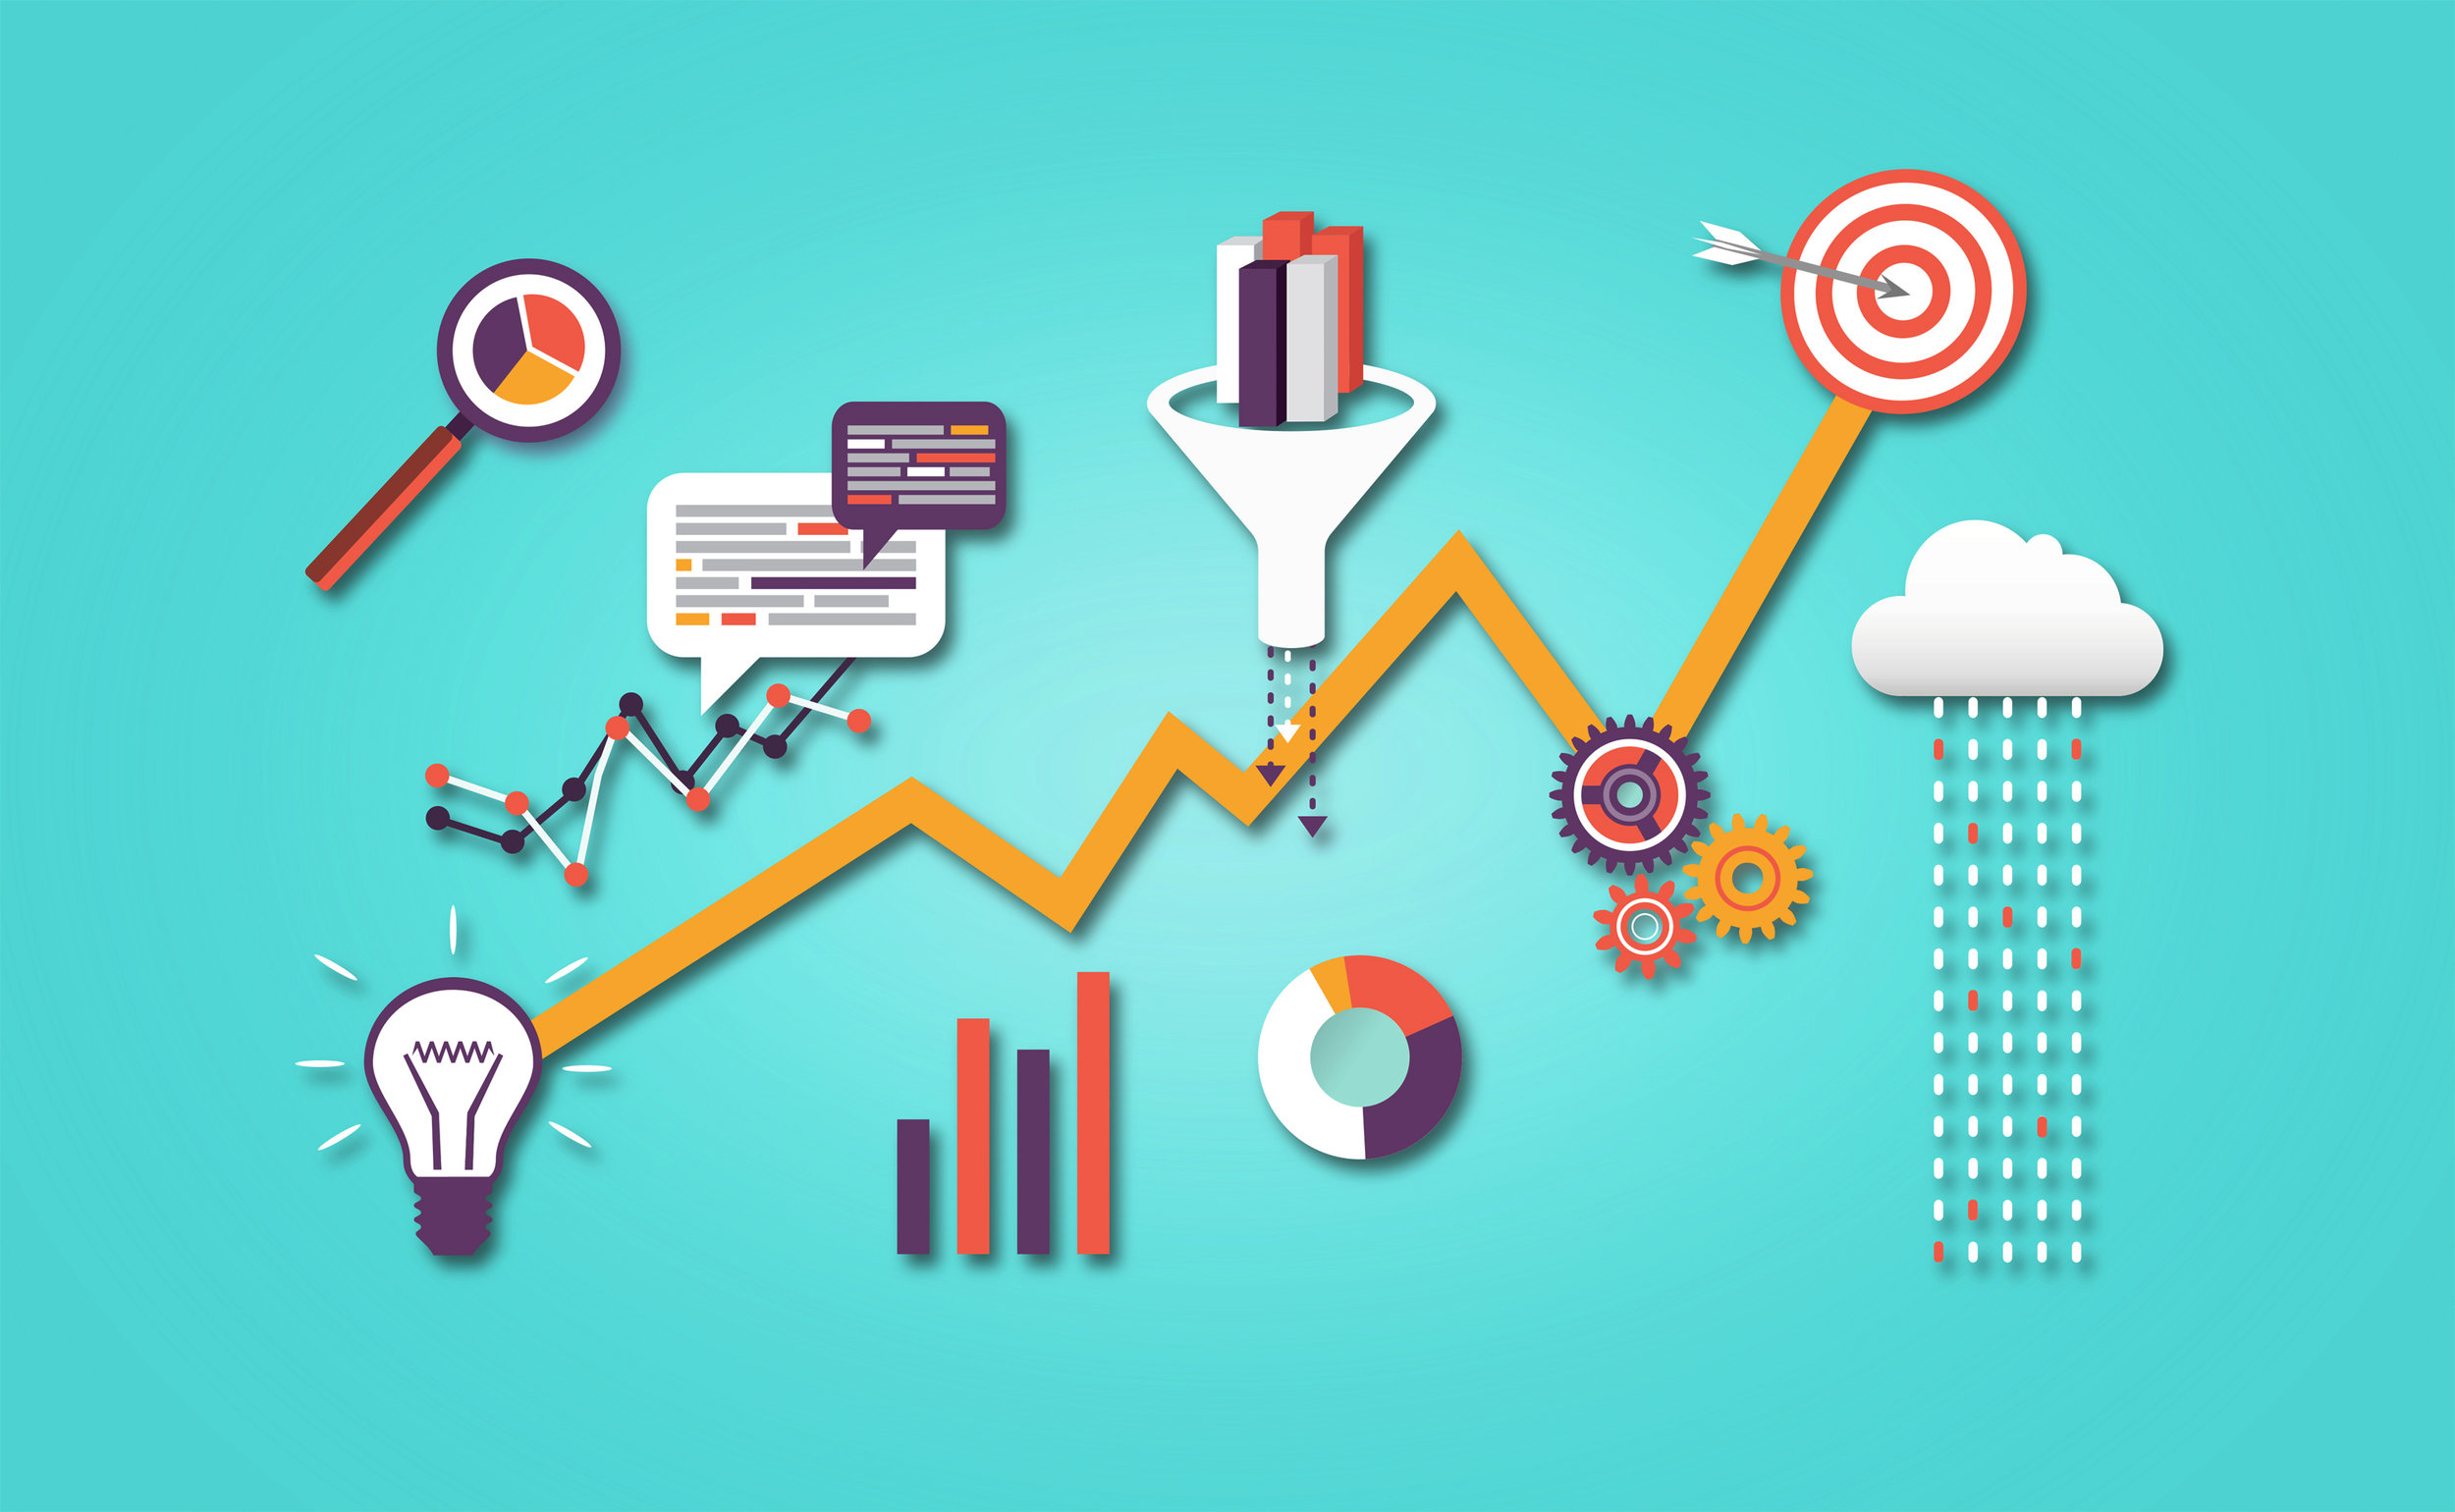 Predictive Analytics, Big Data, Data Cleansing, Data Science, Forecasting, Analytics, Advanced Analytics, Prescriptive Analytics